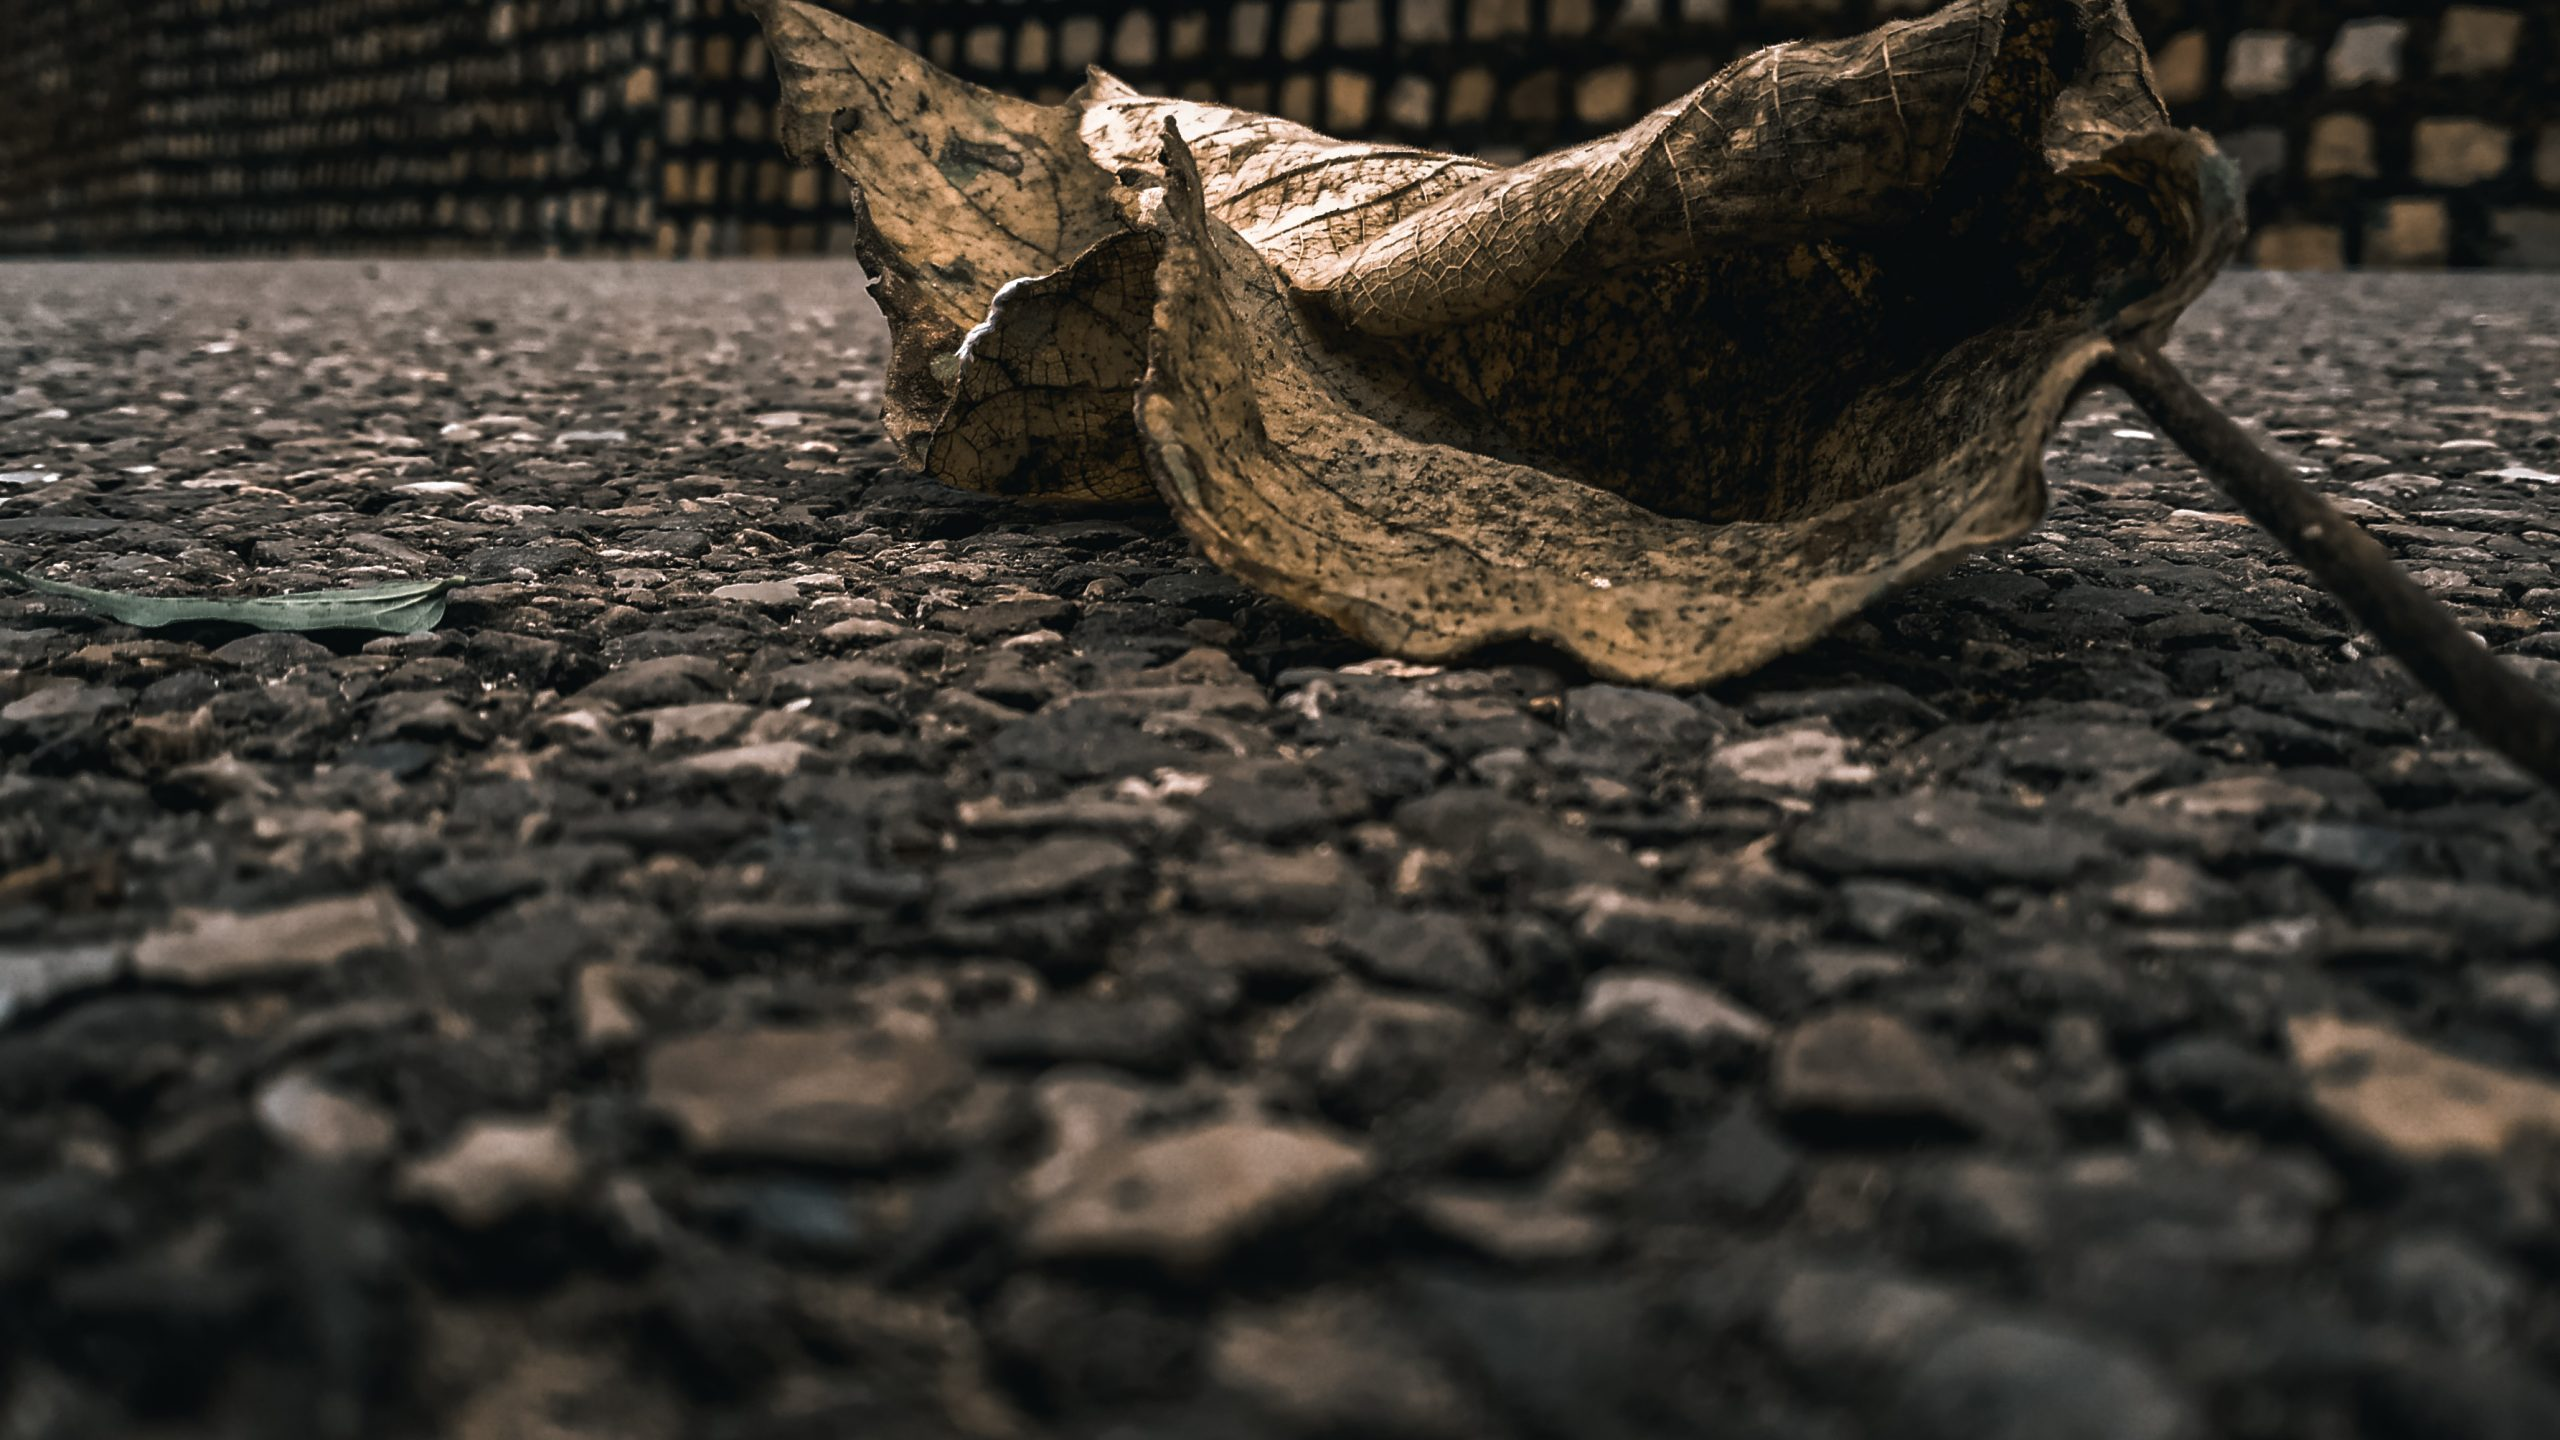 A dry leaf on road